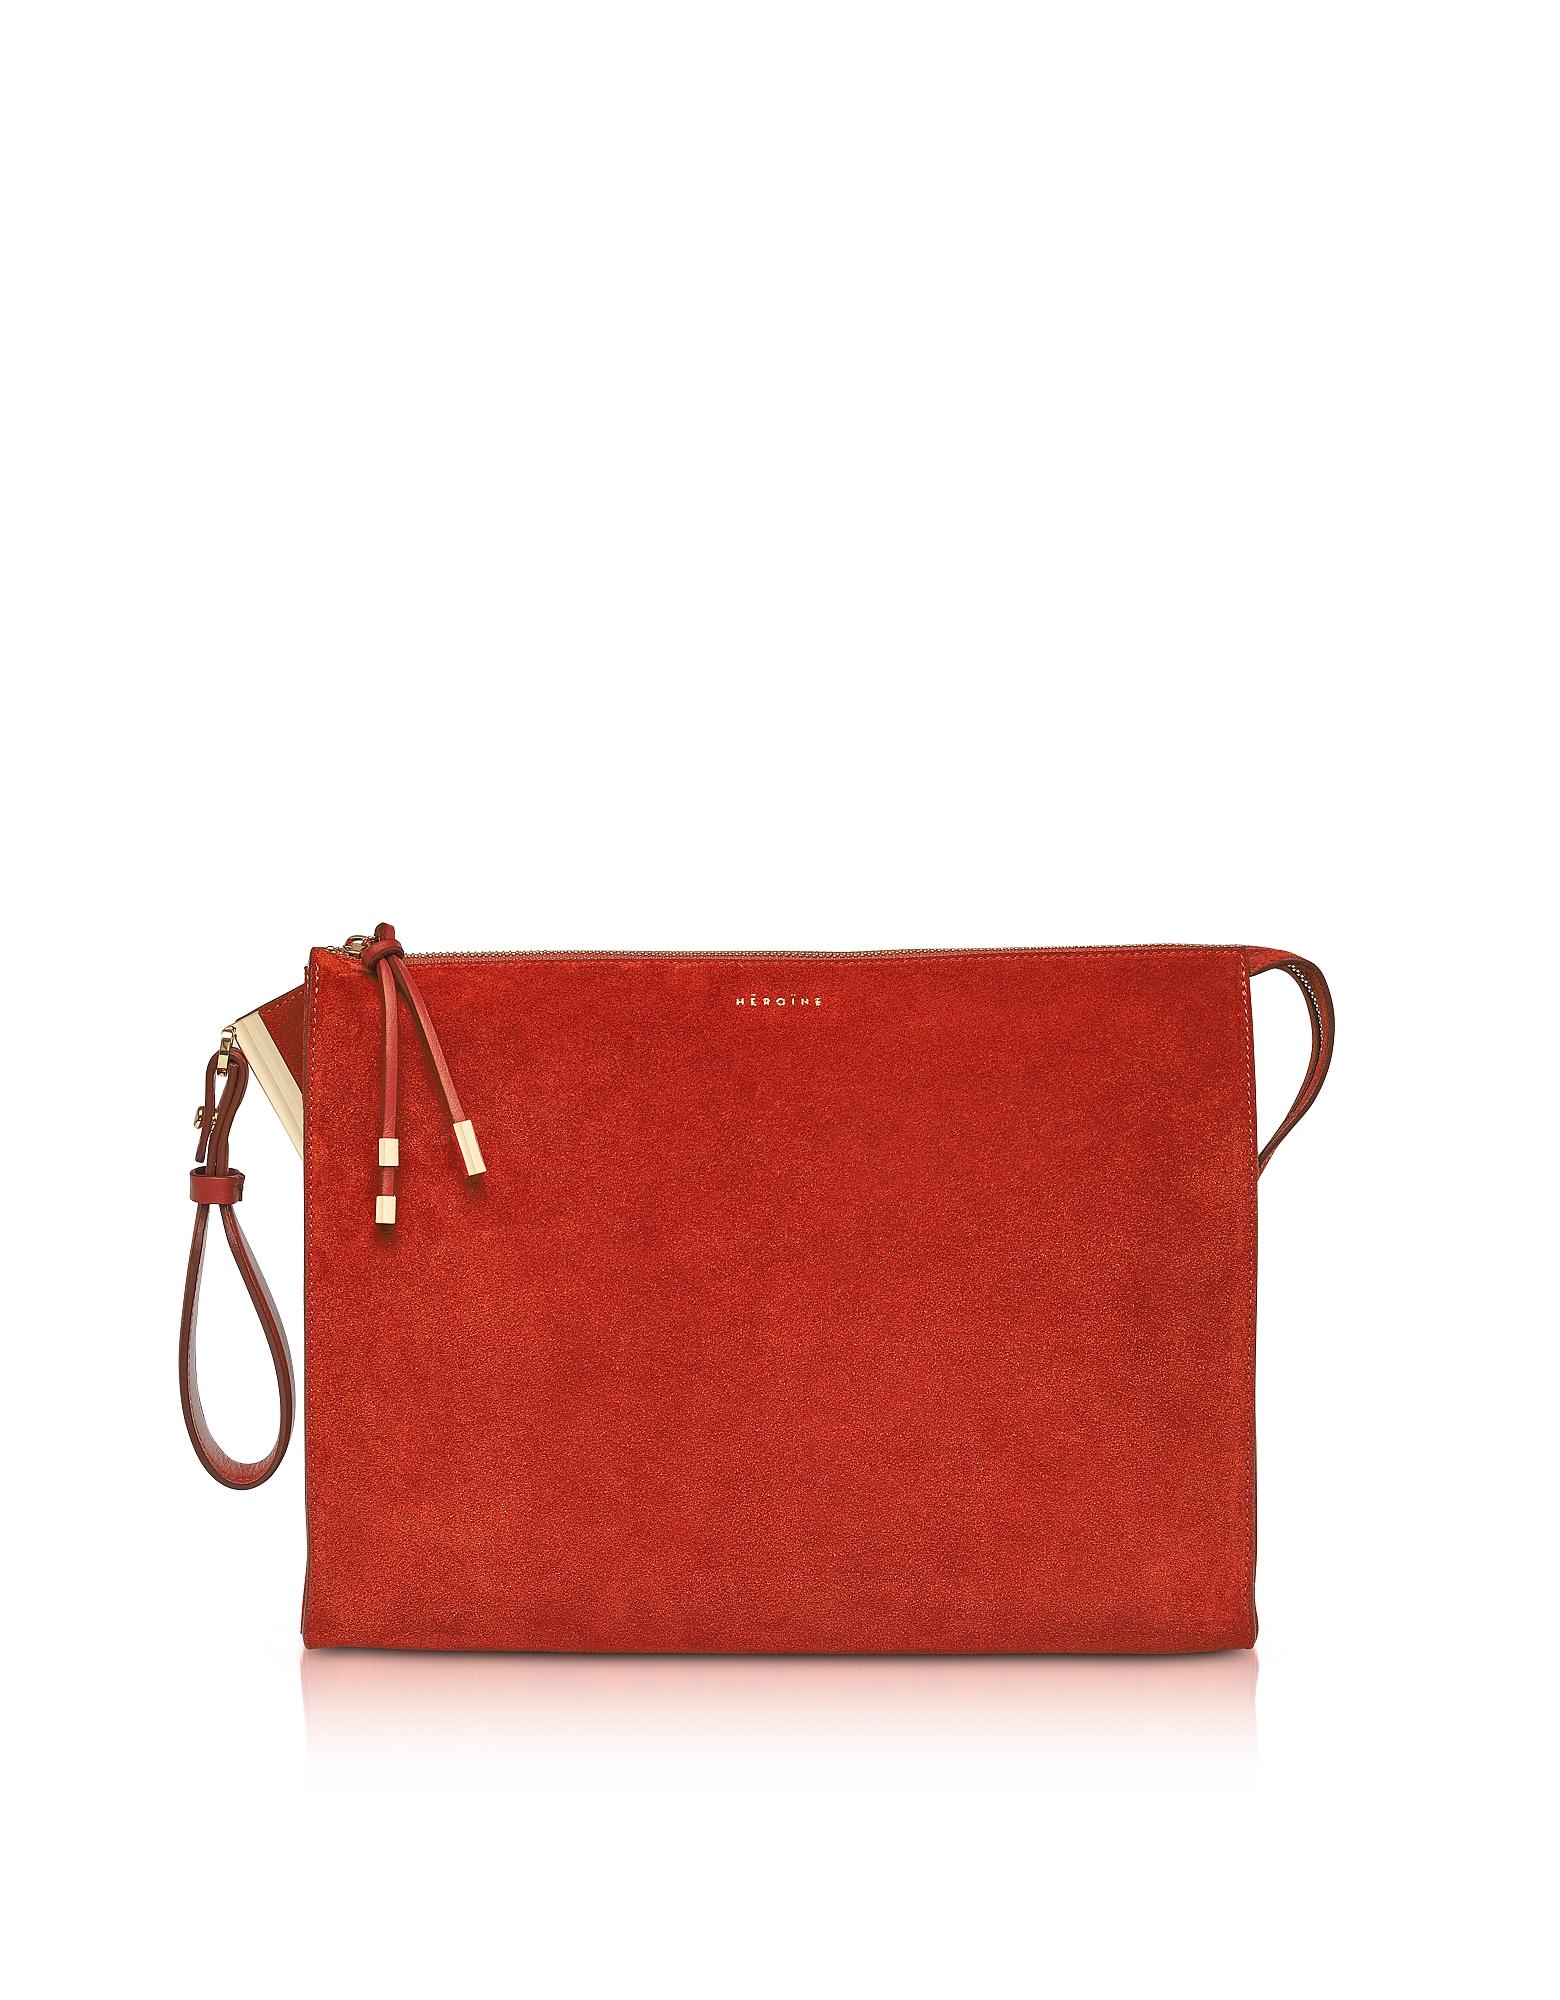 Maison Heroine Designer Handbags, Iva Tablet M Brick Suede Clutch